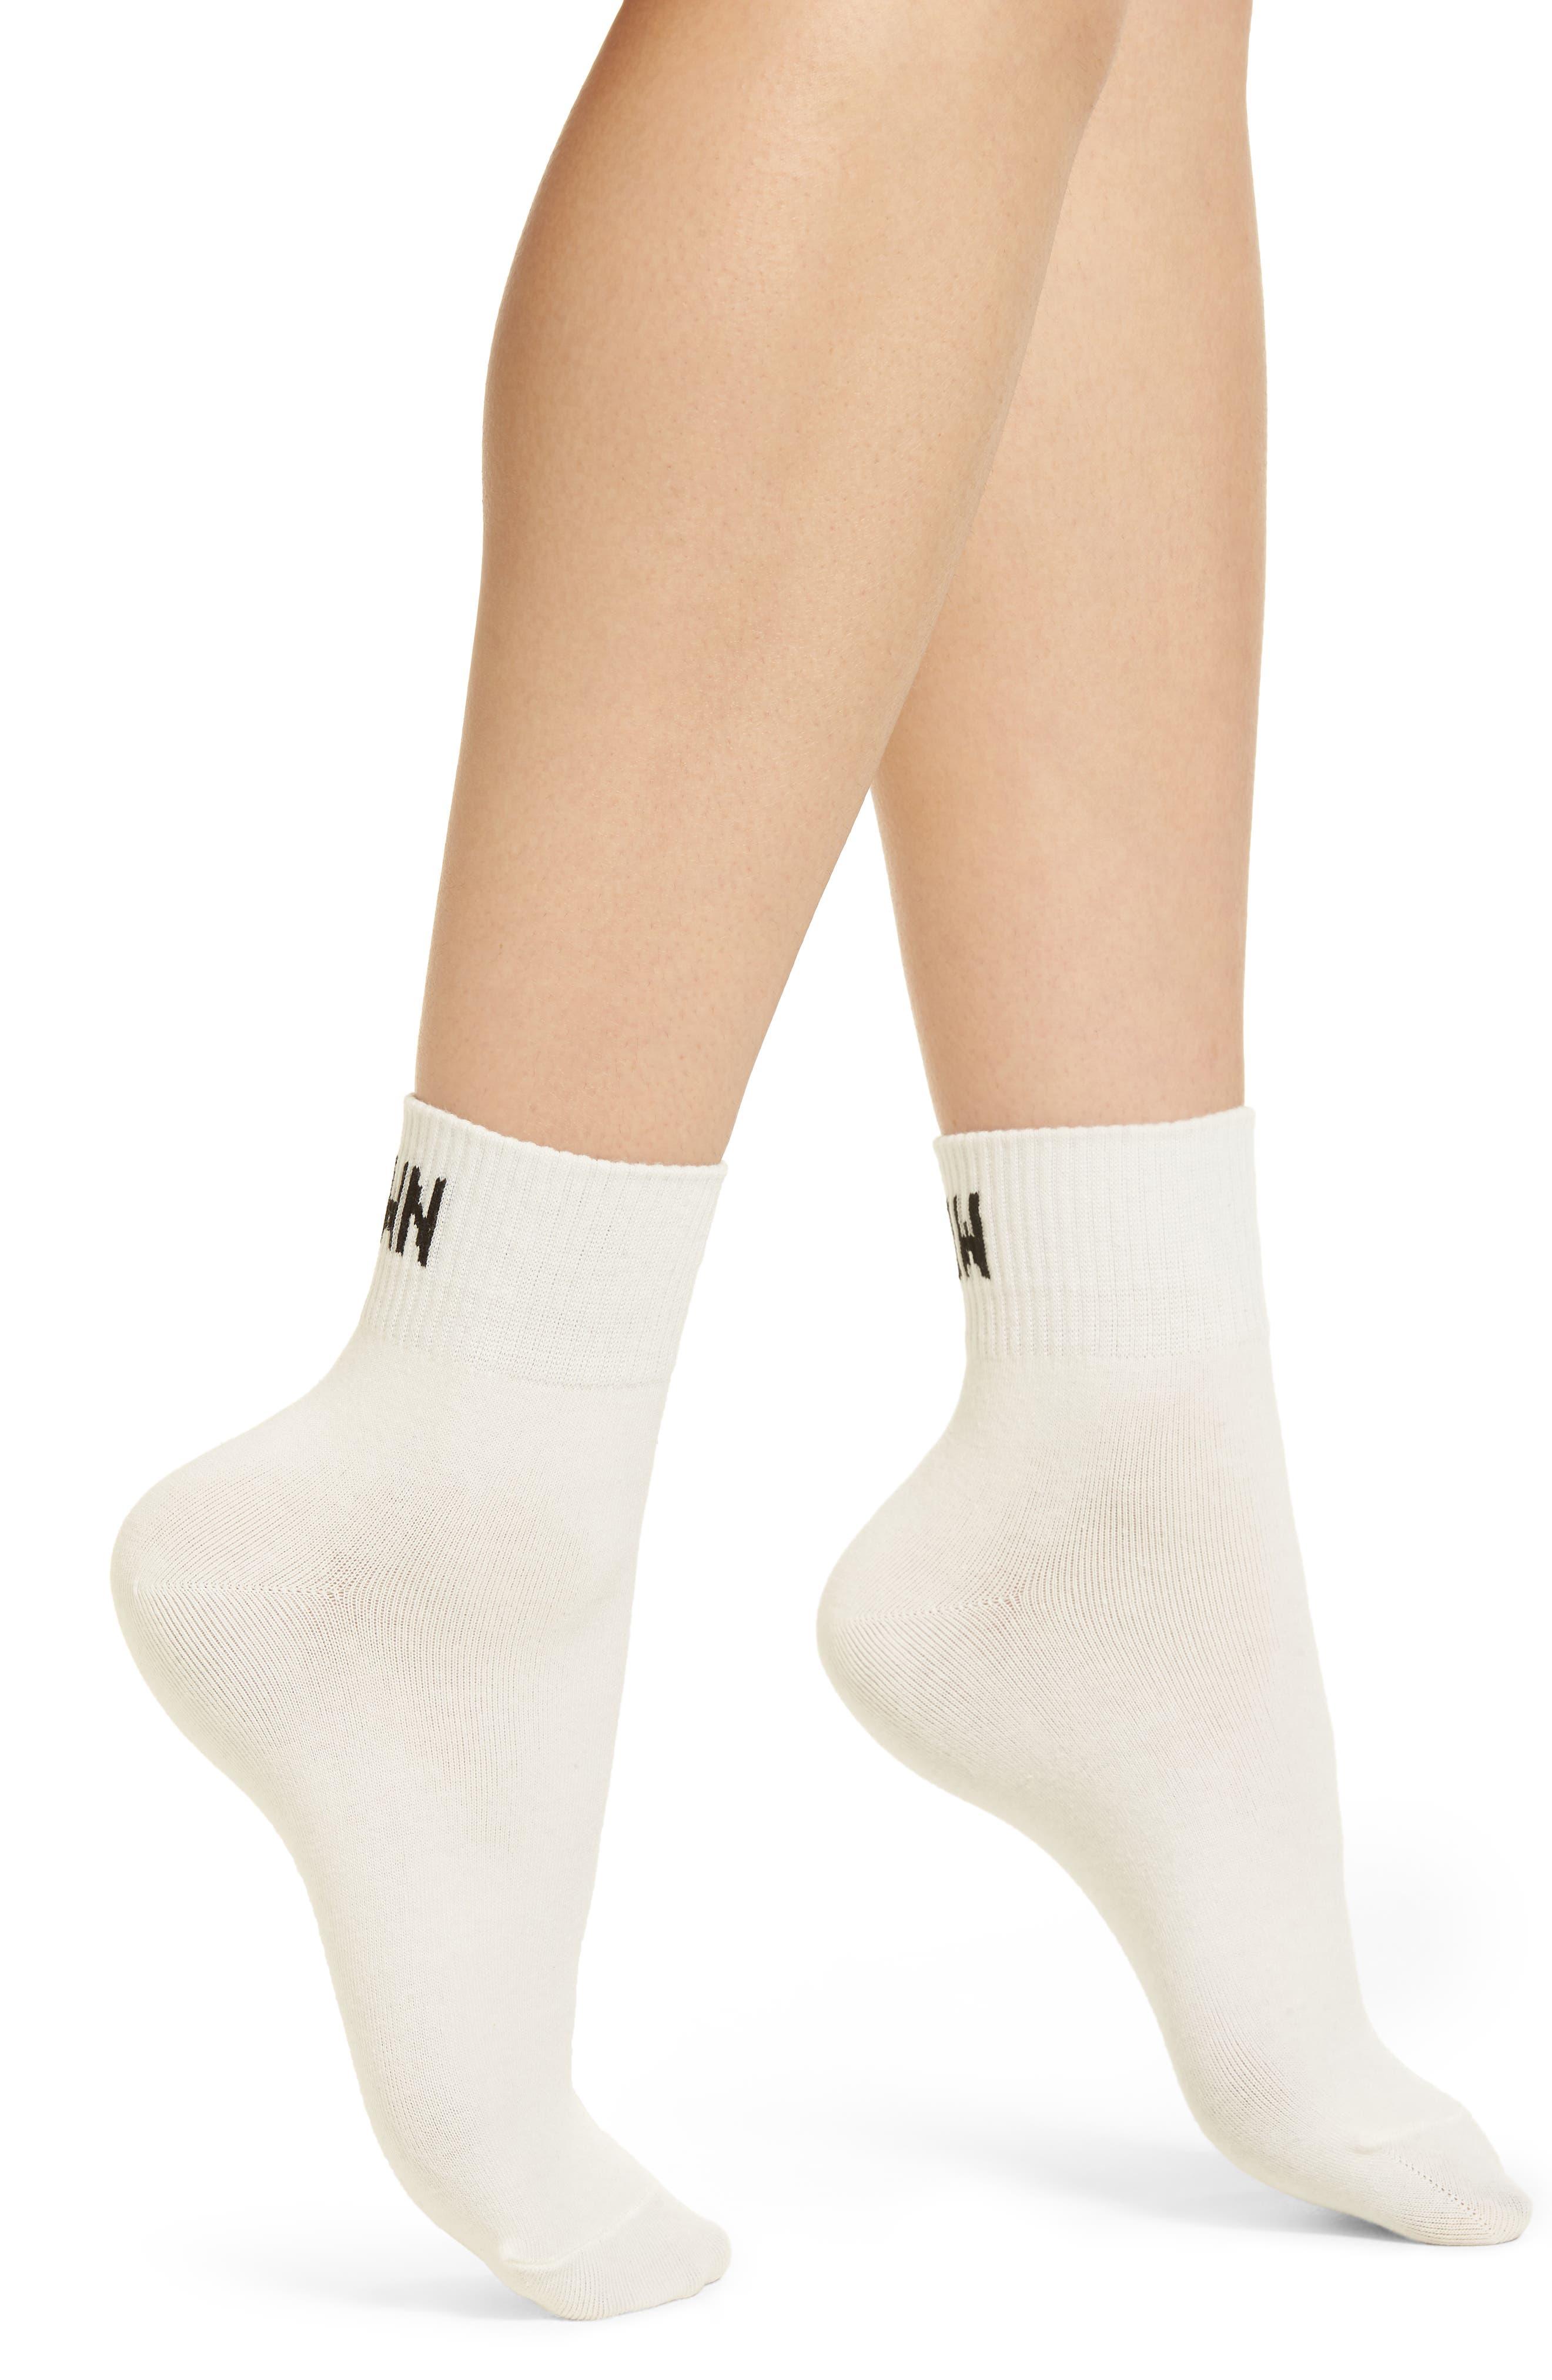 Slow Down Ankle Socks,                             Main thumbnail 1, color,                             100